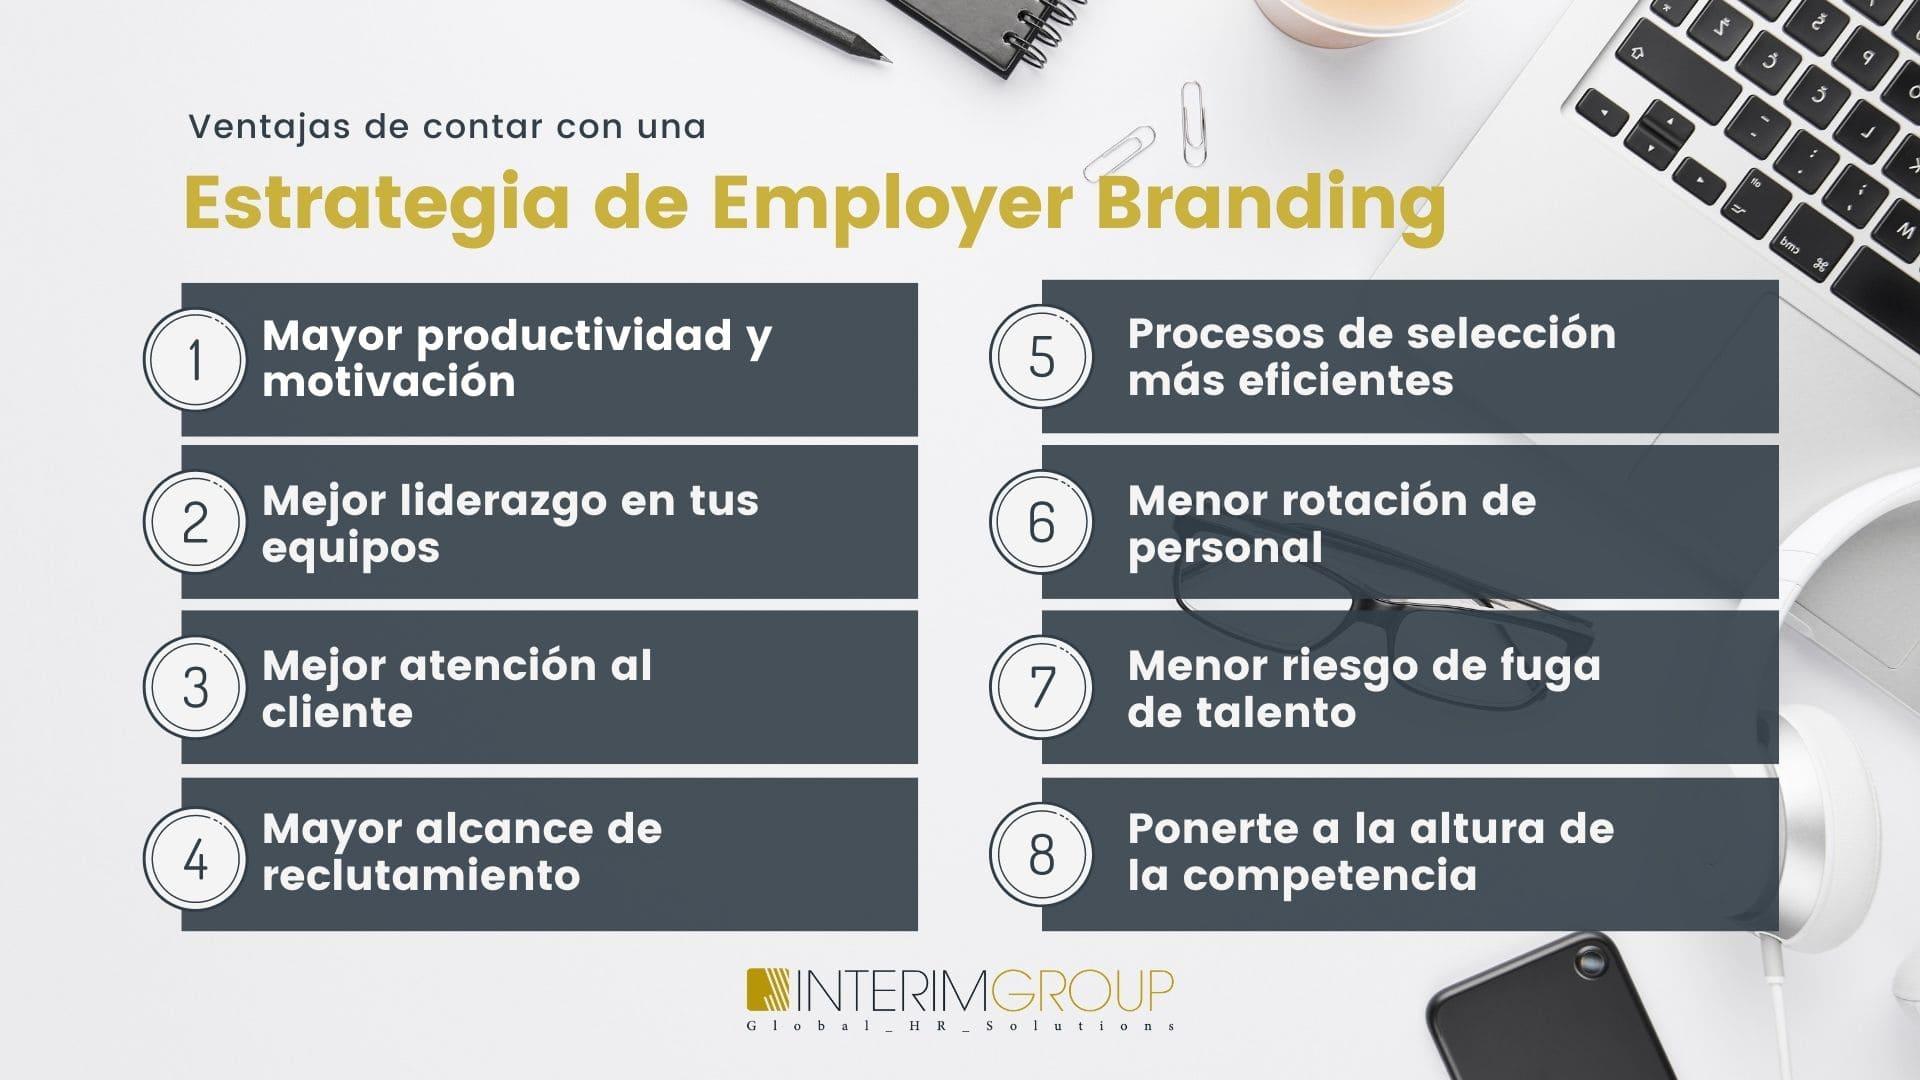 Employer-branding-rrhh_INTERIM-GROUP_2 (1)